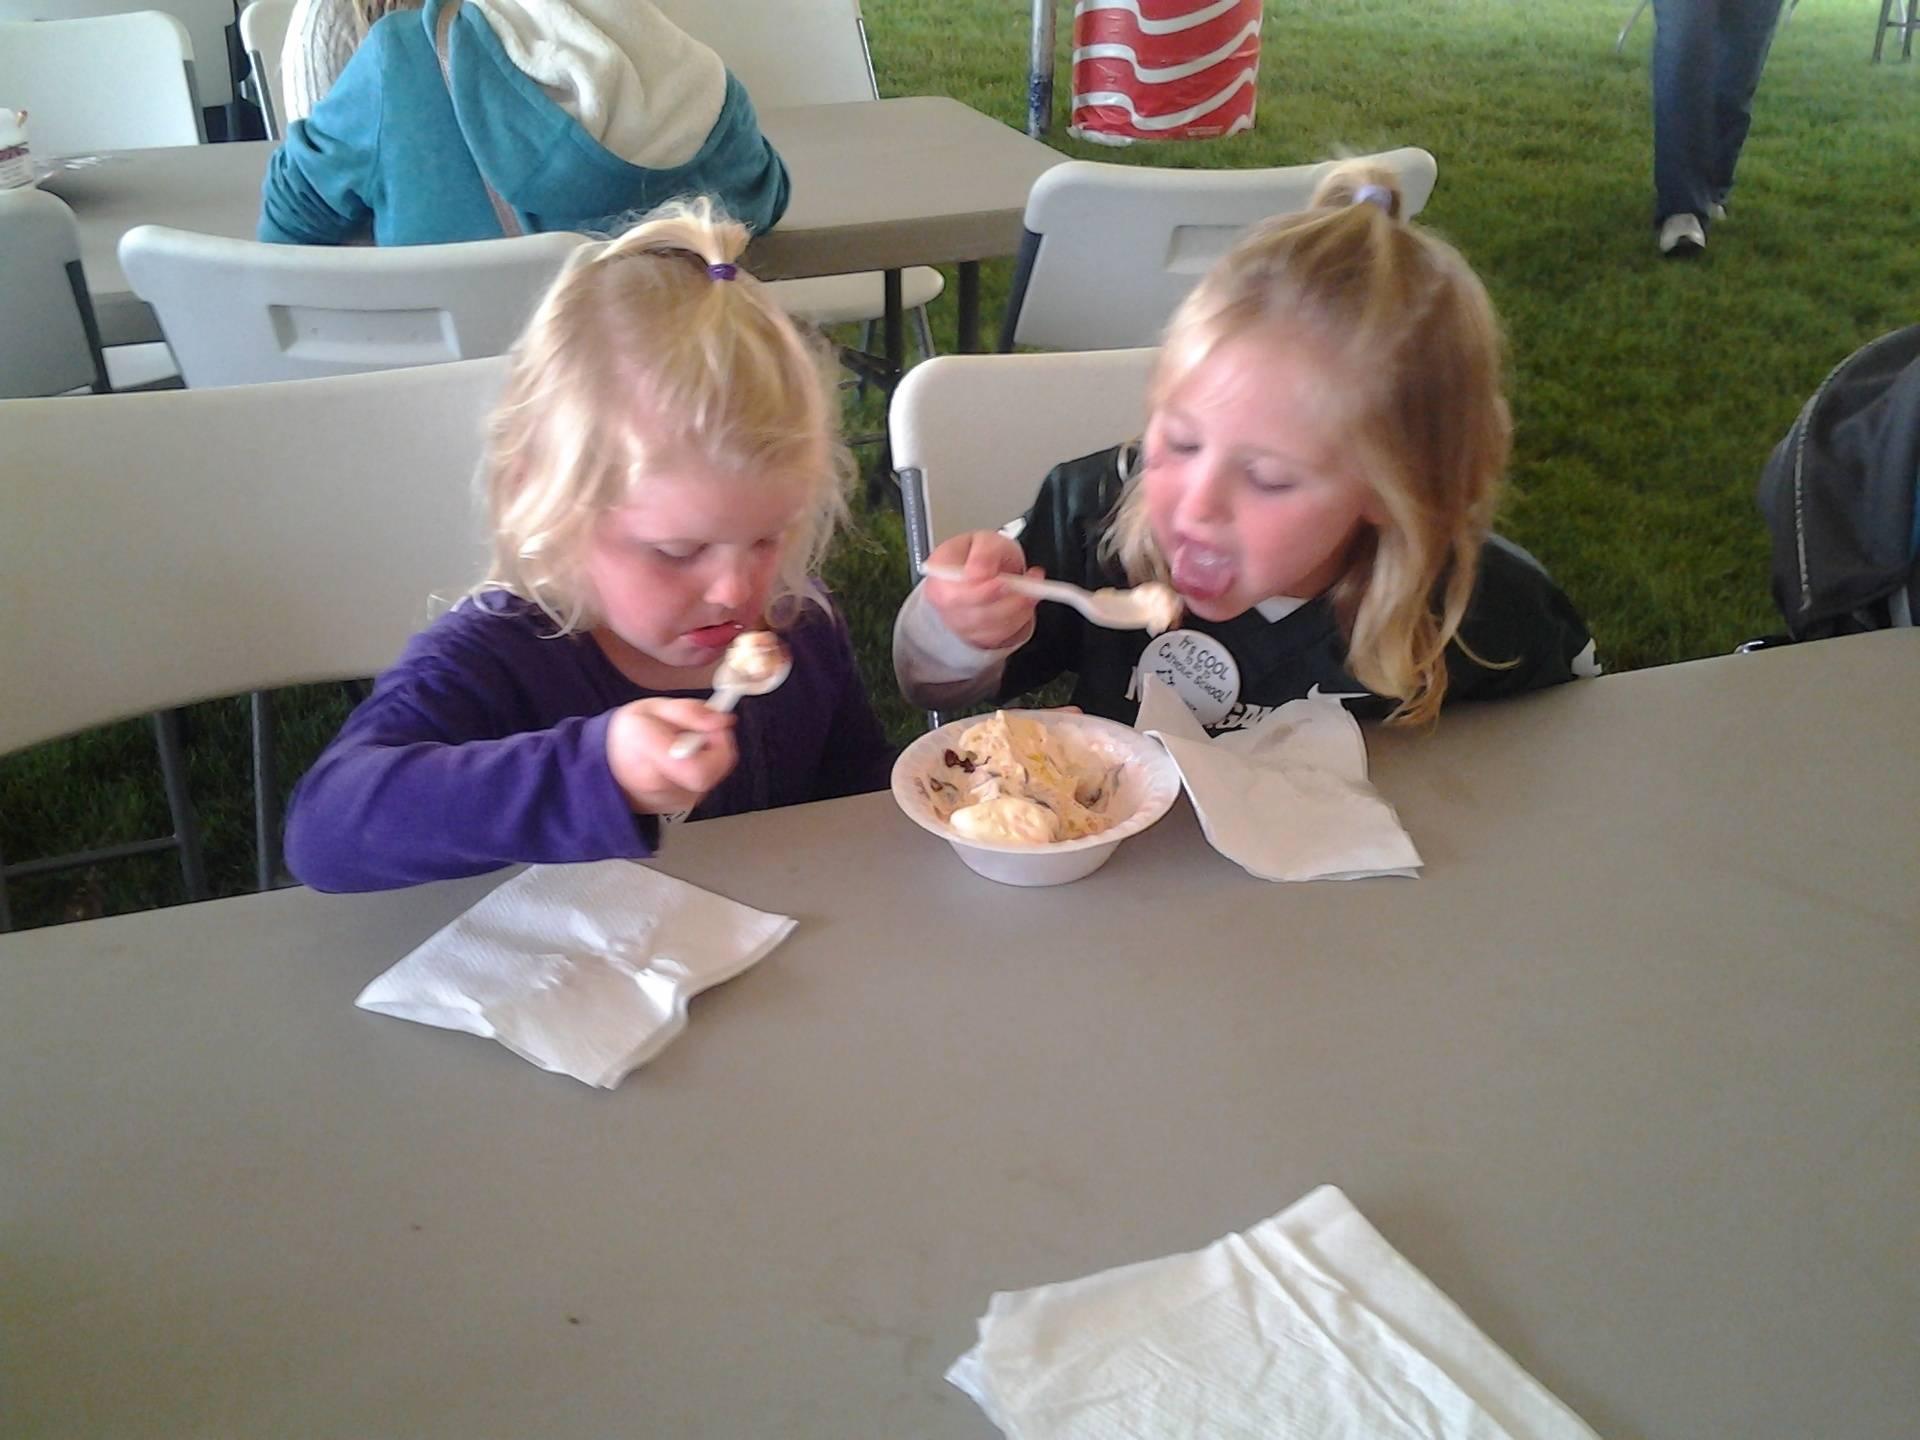 Sharing an ice cream sundae.